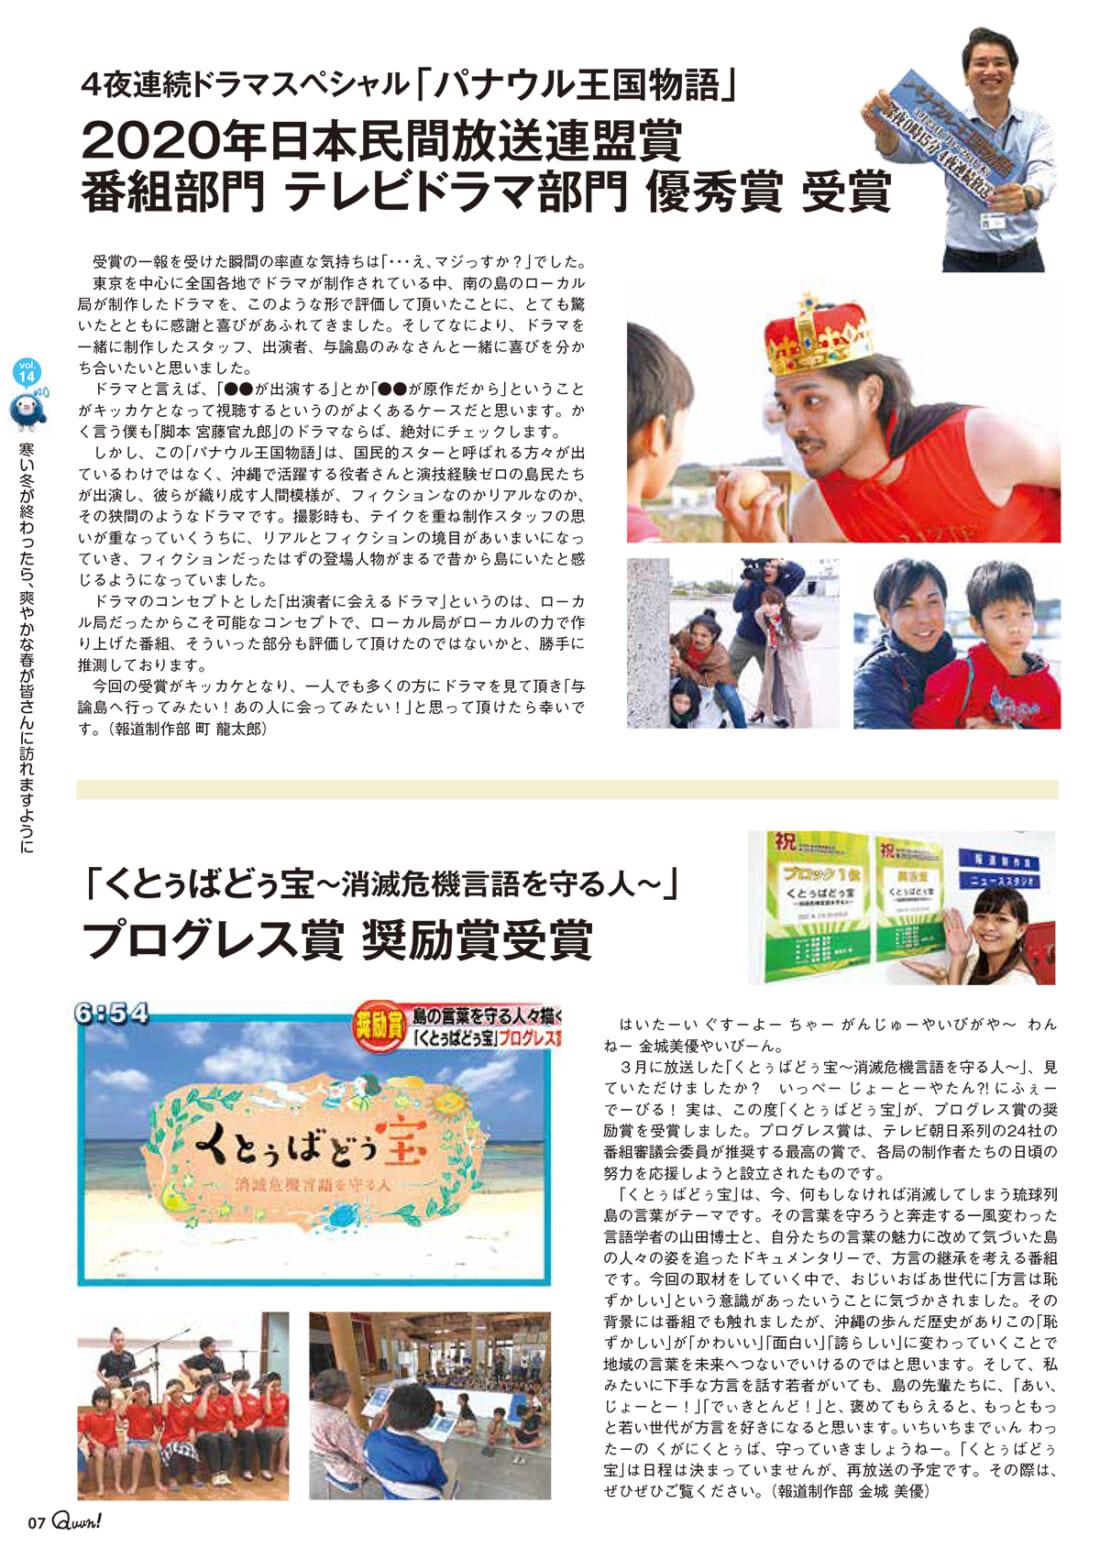 https://www.qab.co.jp/qgoro/wp-content/uploads/quun_1409-1100x1558.jpg